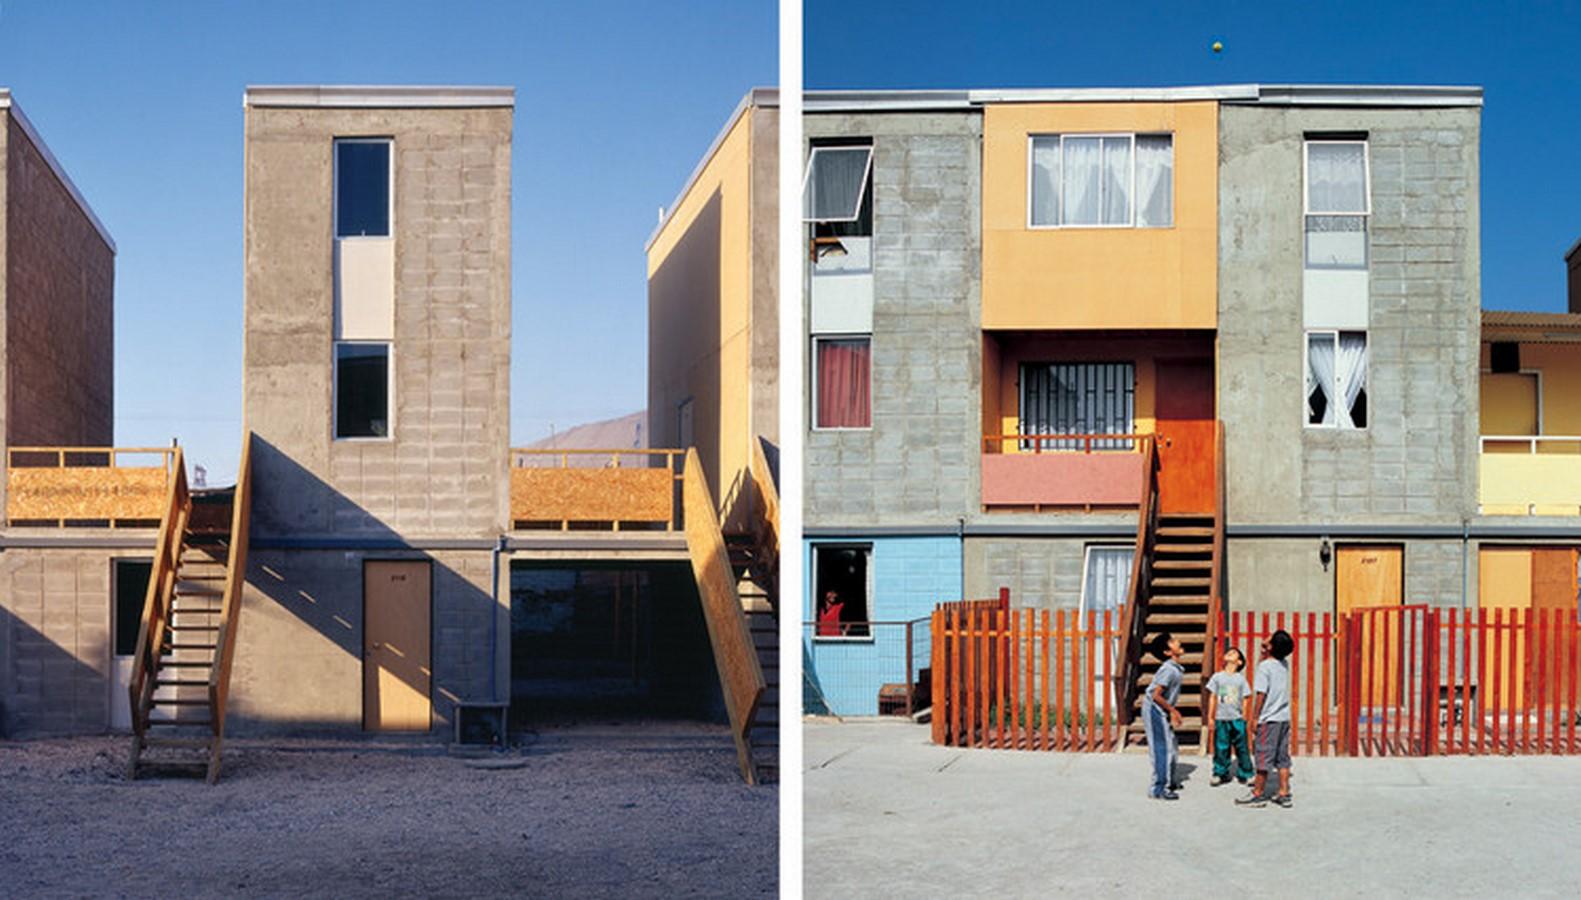 Quinta Monroy, Chile by Alejandro Aravena: Architectre for social impact- Sheet3